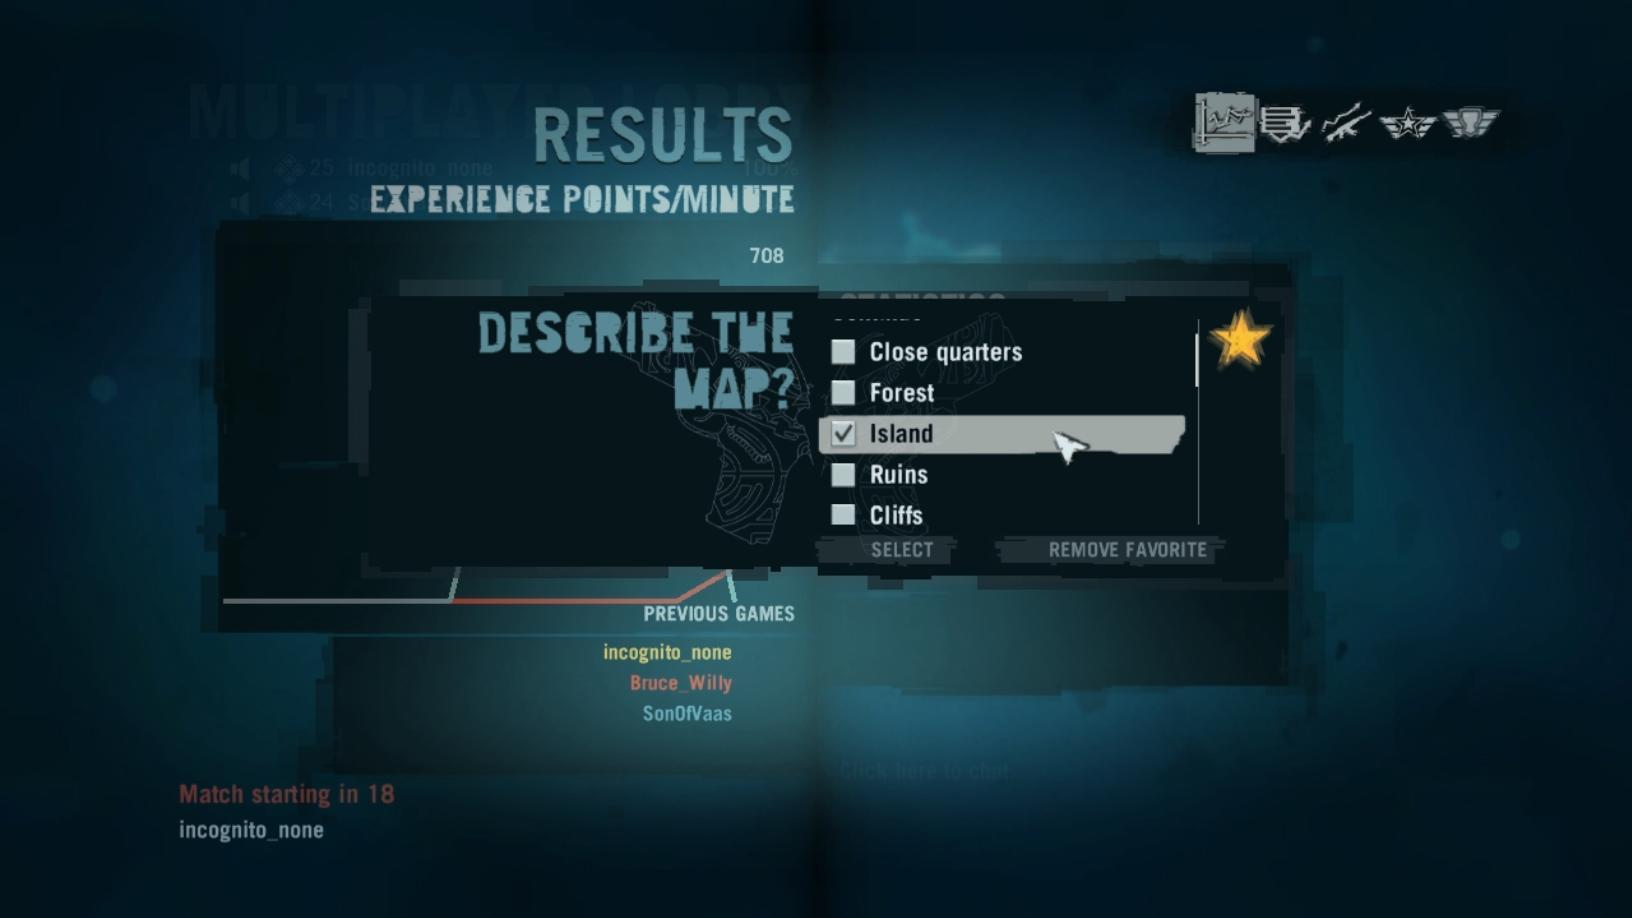 Скриншоты для игры Far Cry 3 , Скриншоты игры на Igroport.ru